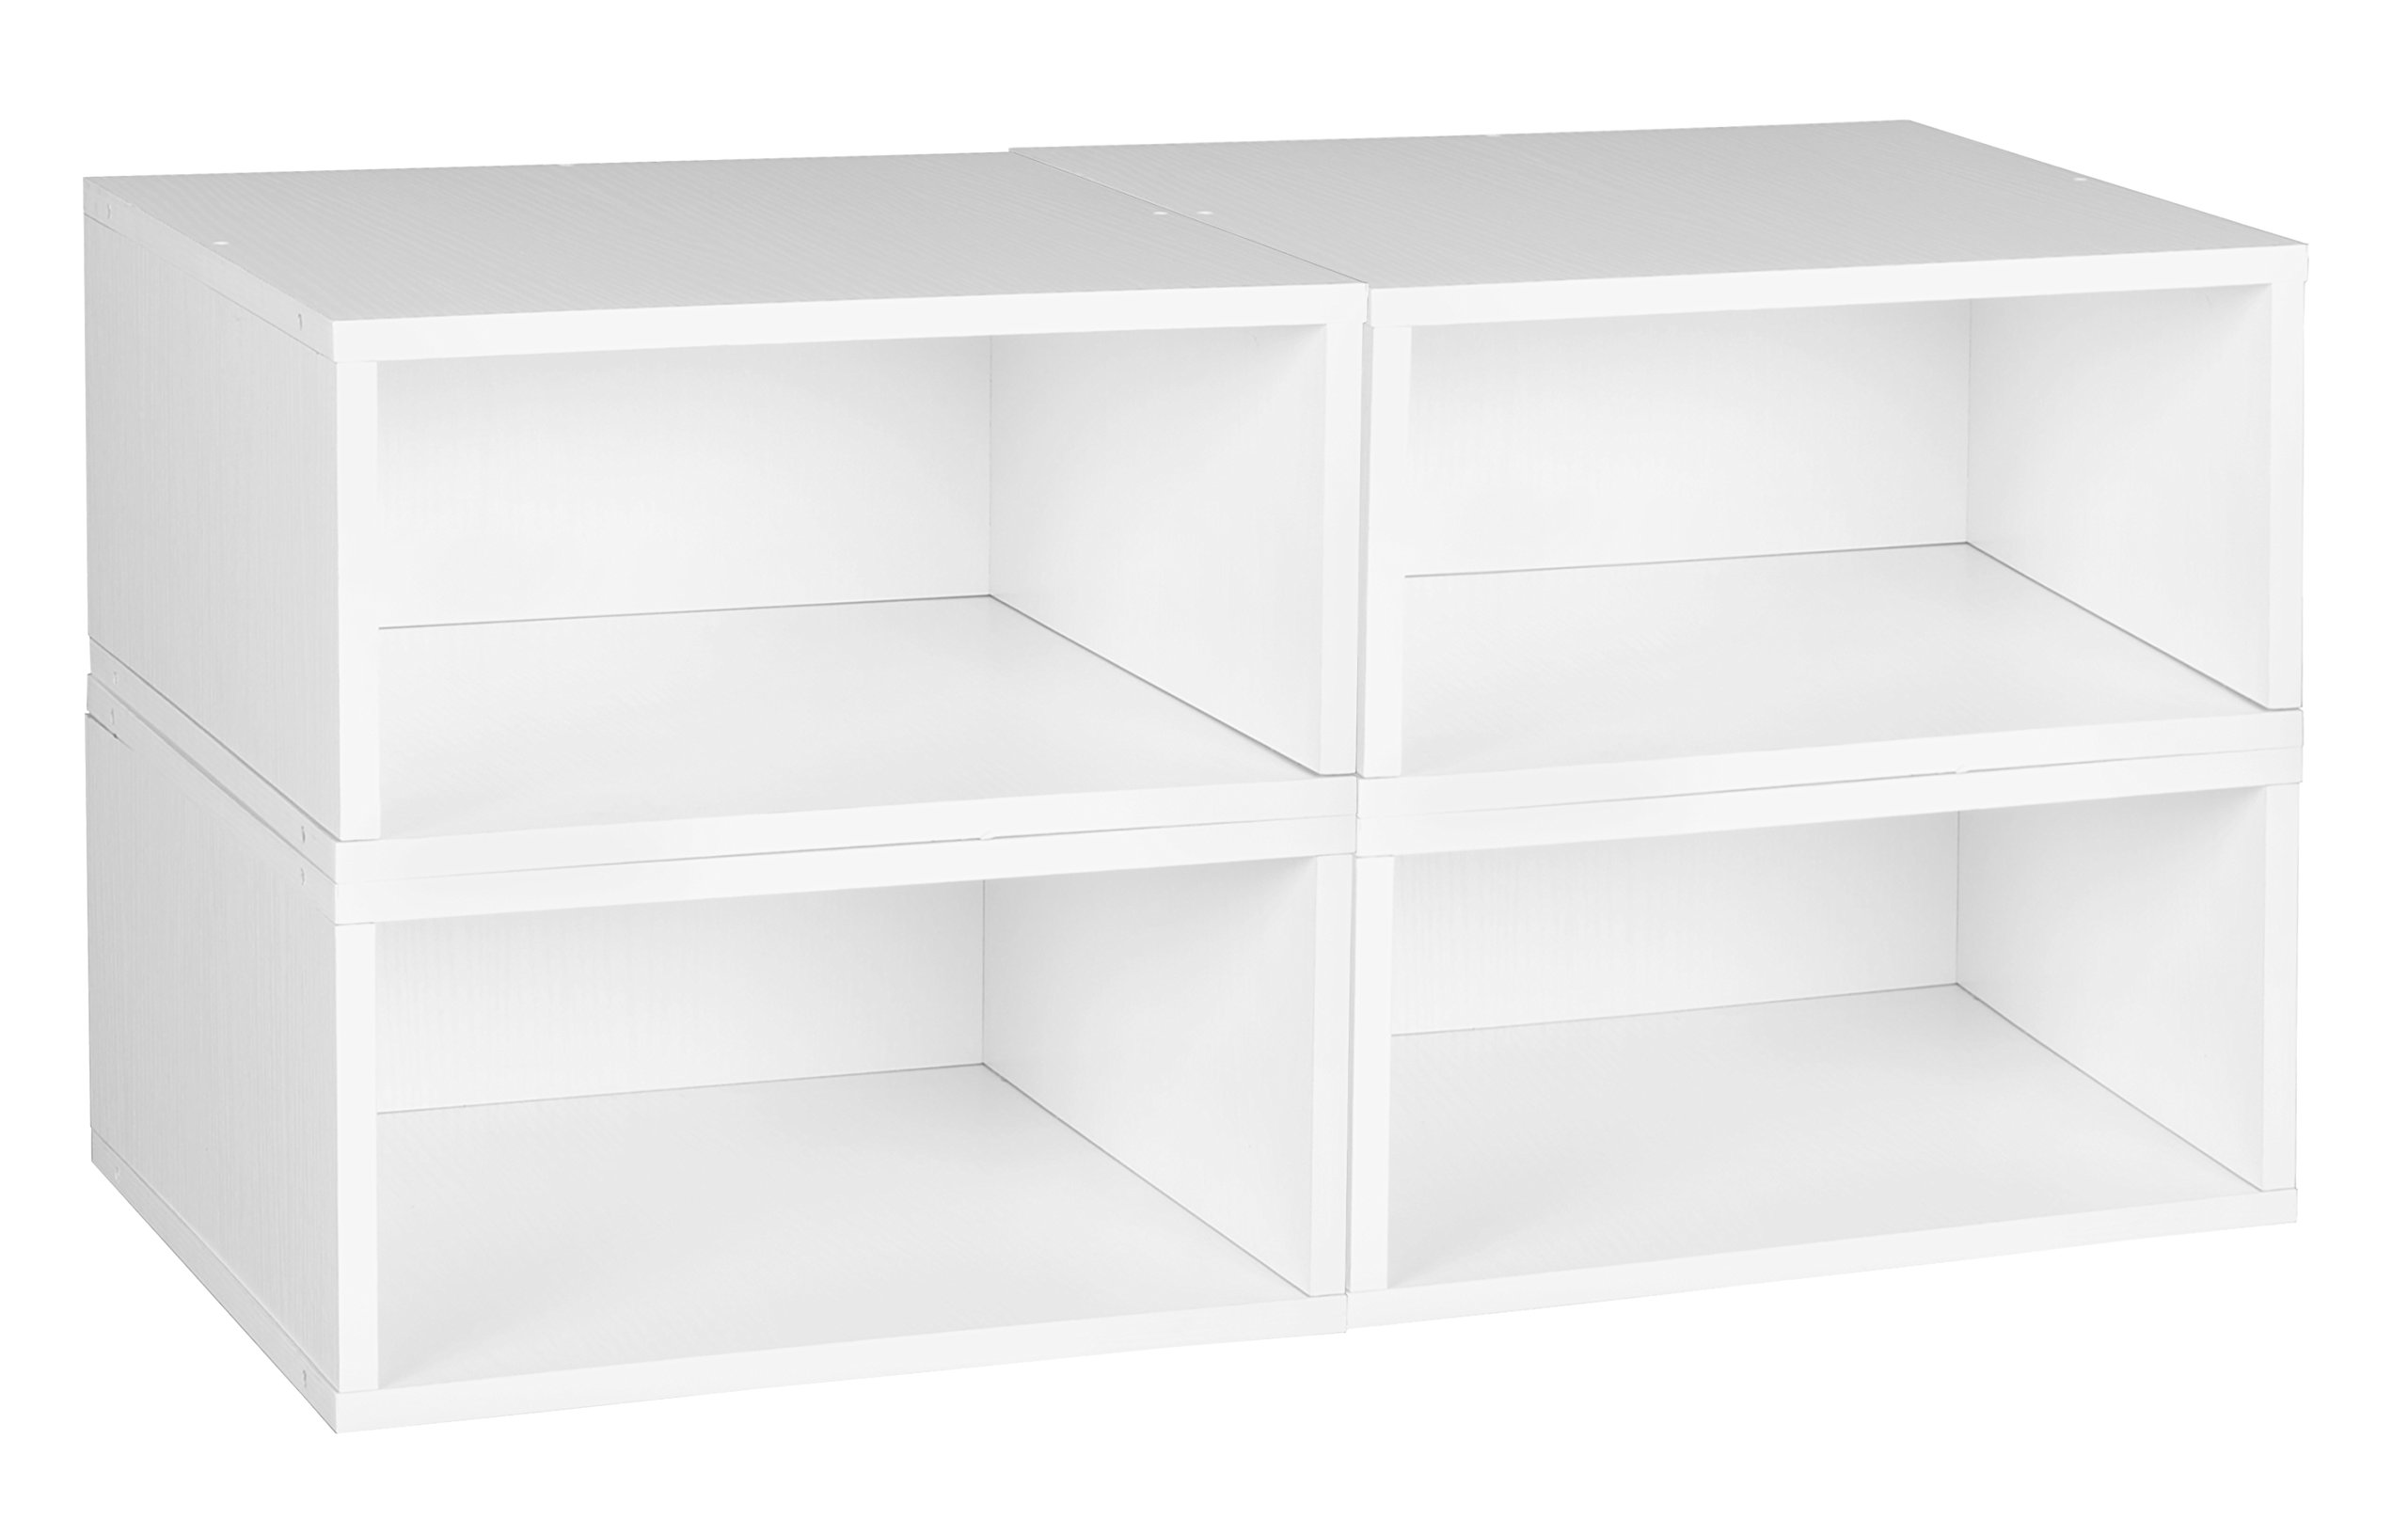 Niche PC064PKWH Cubo Storage Set 4 Half Size Cubes, White Wood Grain